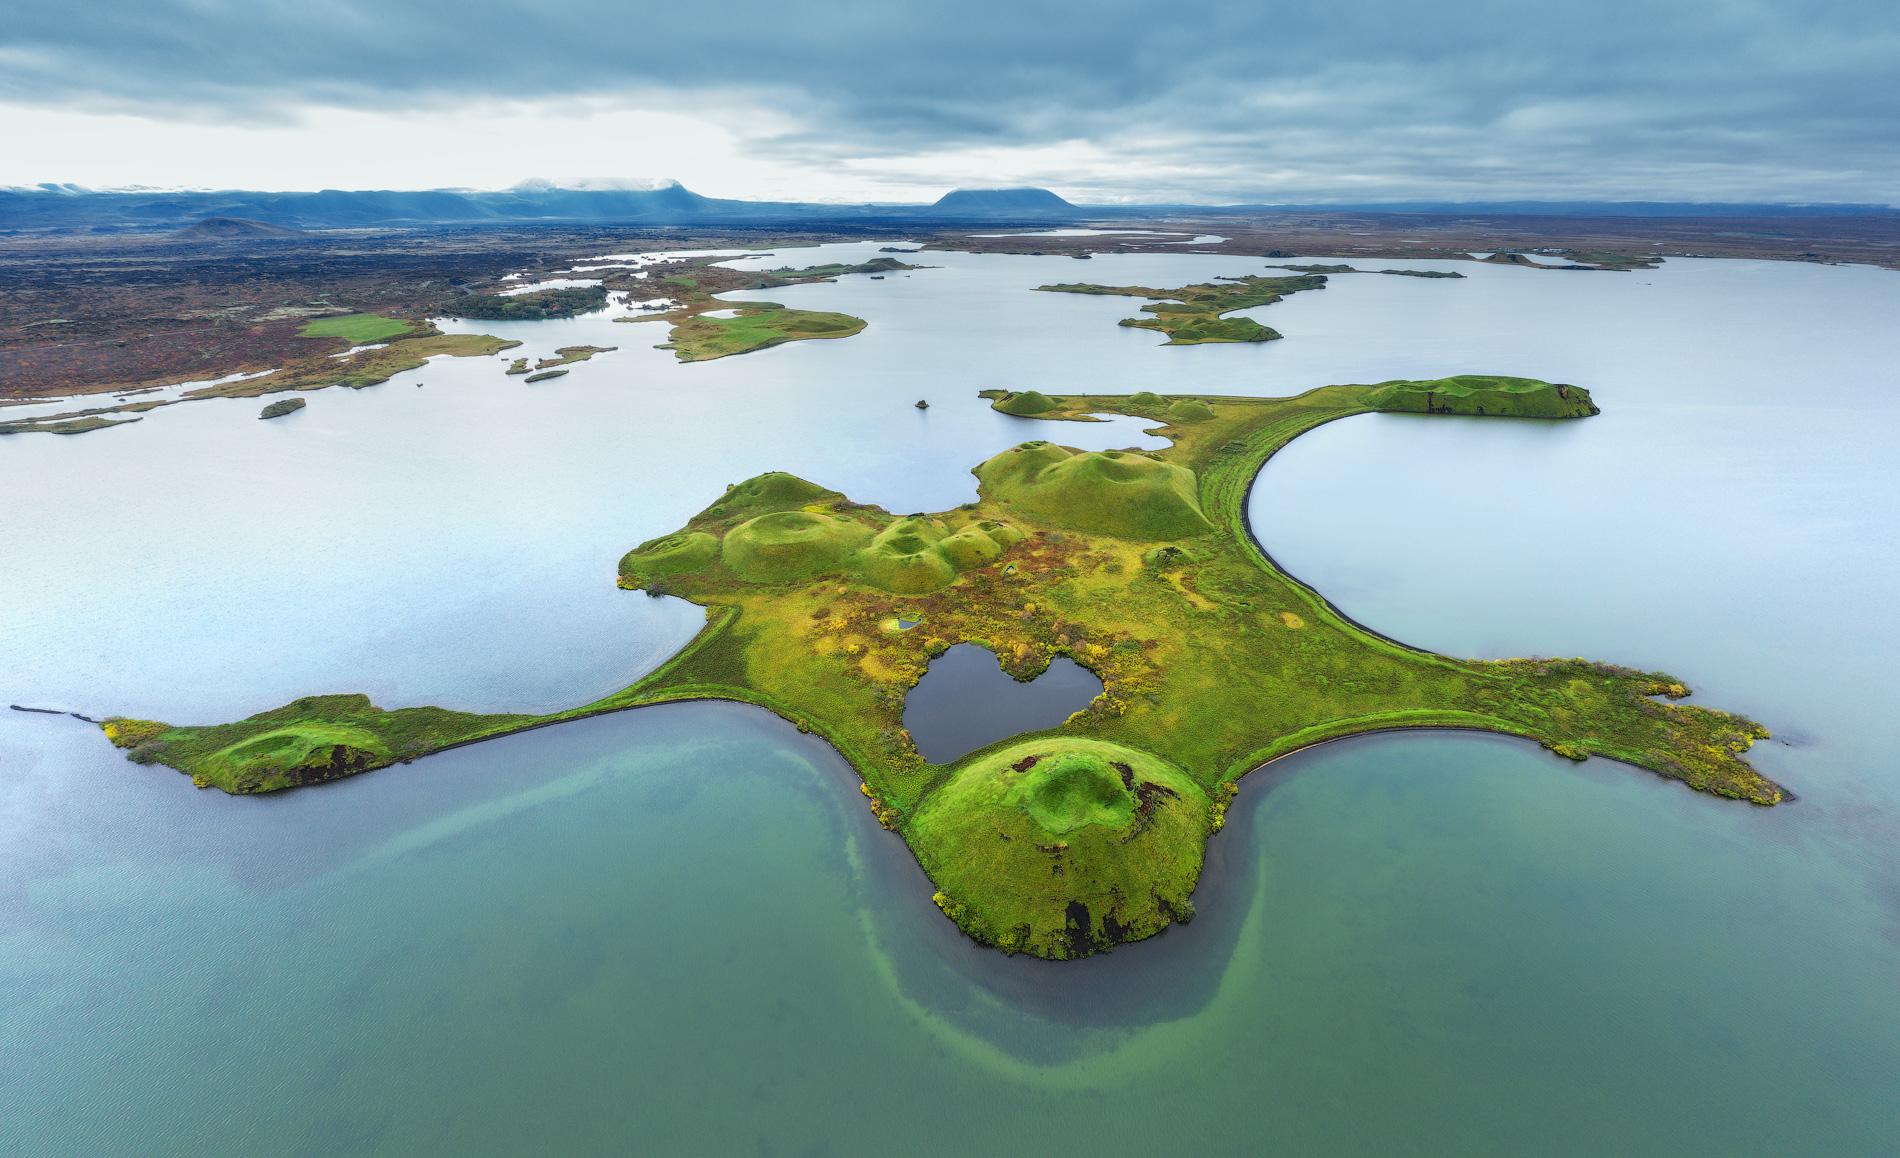 Lake Mývatn has a rich bird life in the summer.